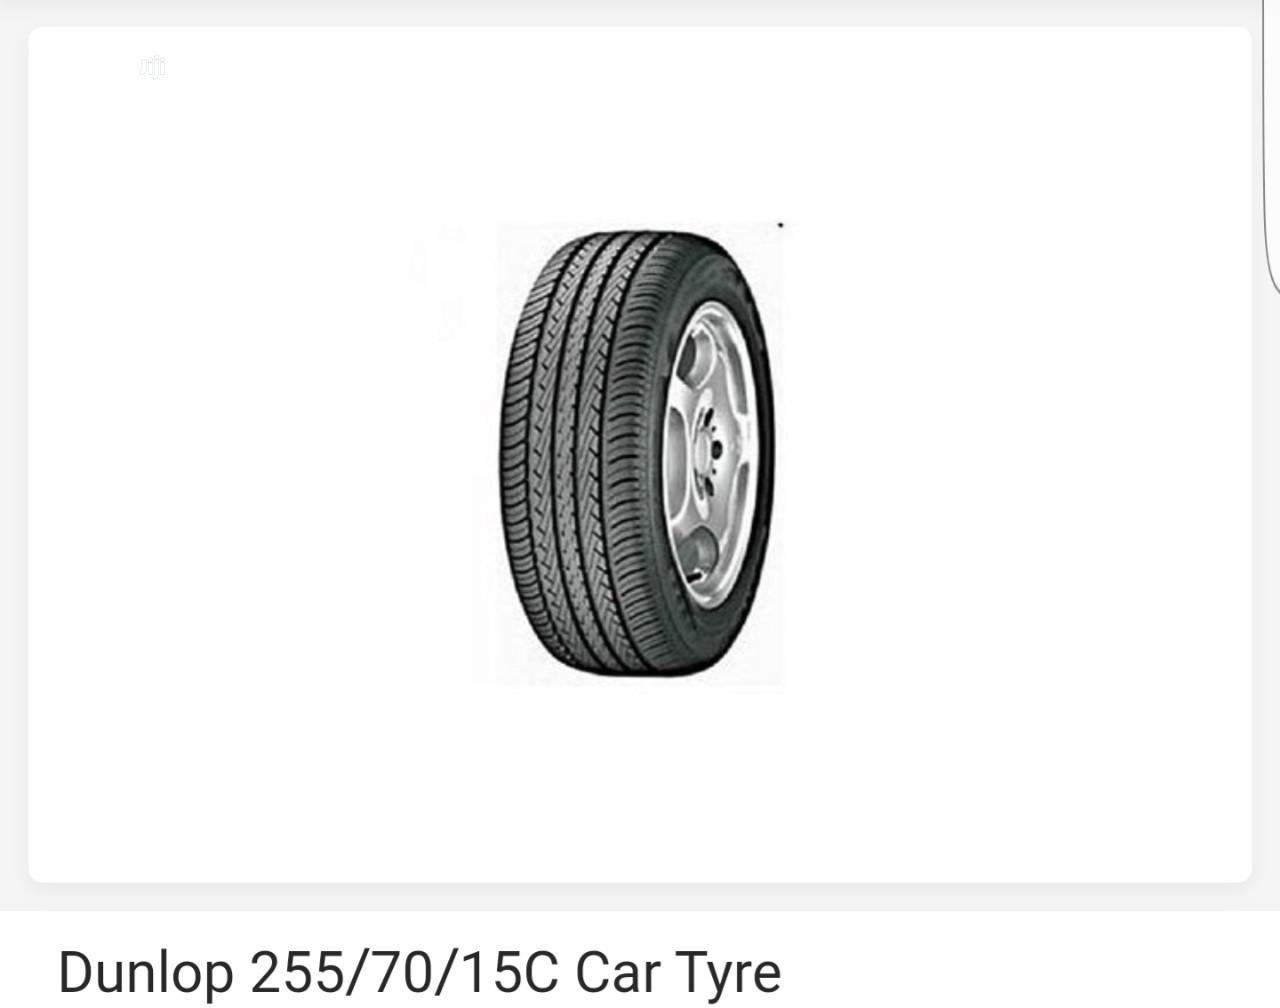 255/70/15C Dunlop Tyre